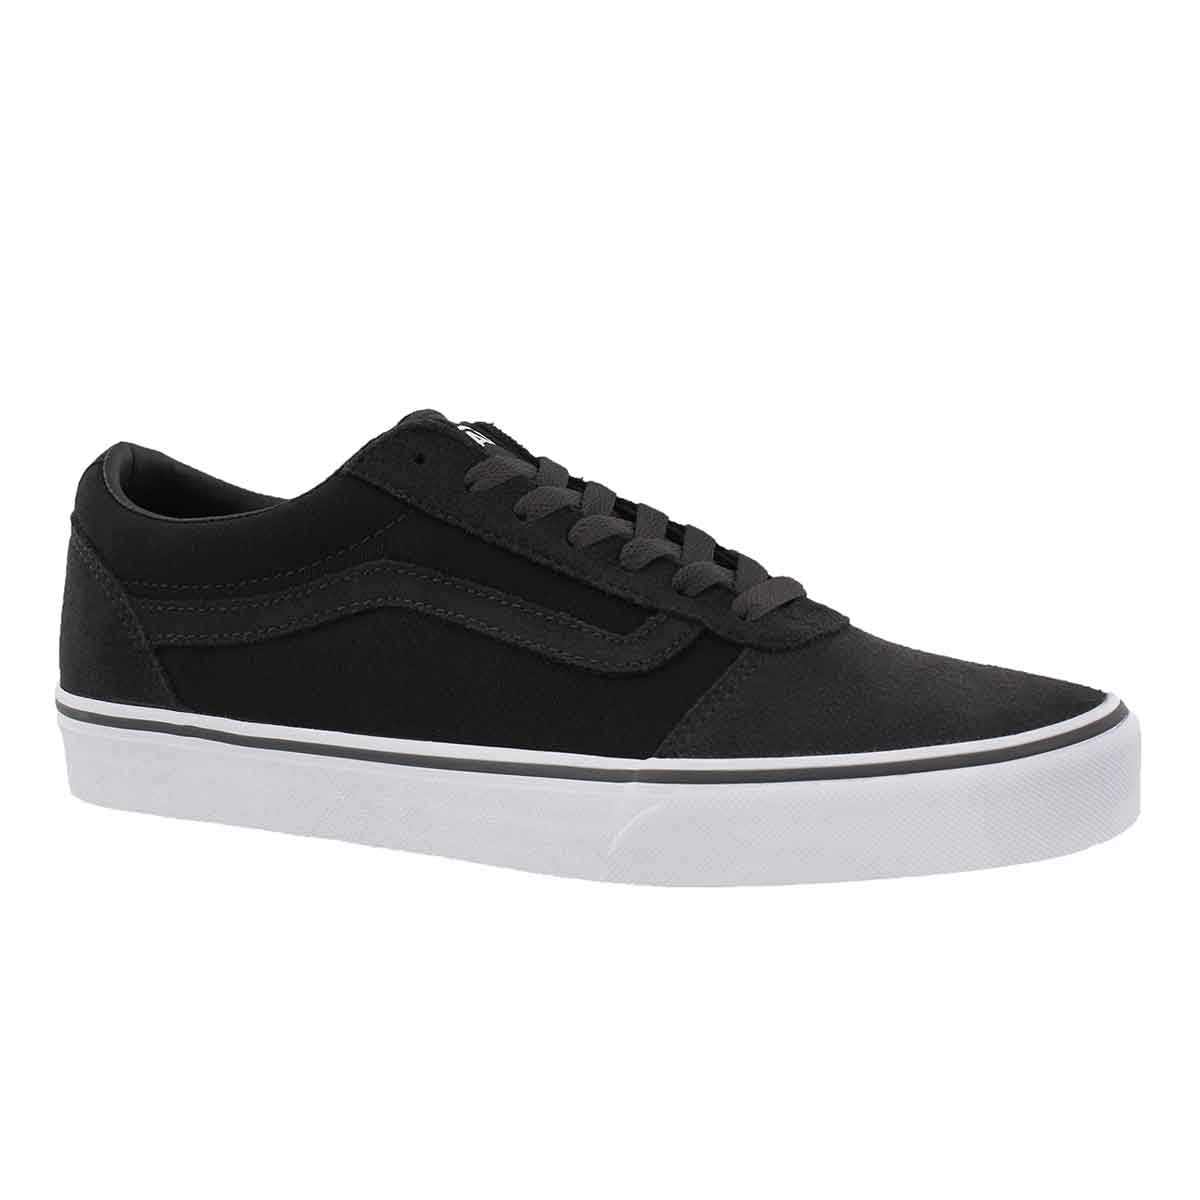 Men's WARD blk/asphalt lace up sneakers